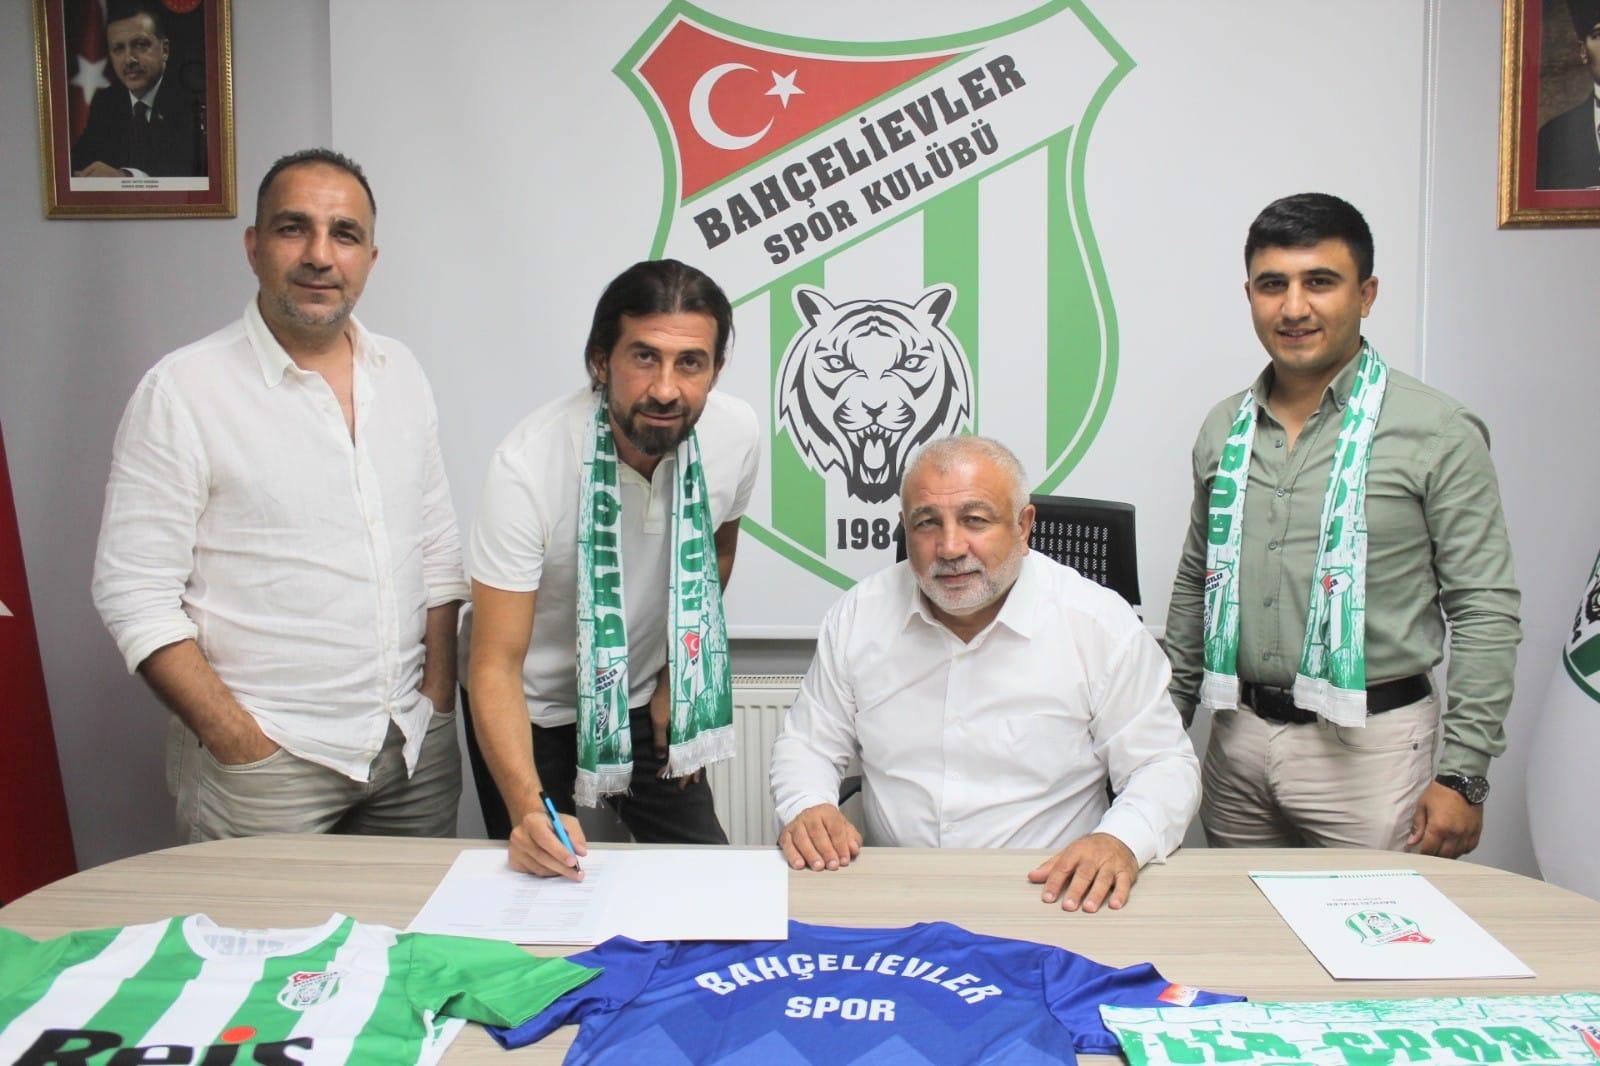 Teknik adam Serdar Hoşhan, Bahçelievlerspor'a EVET dedi.